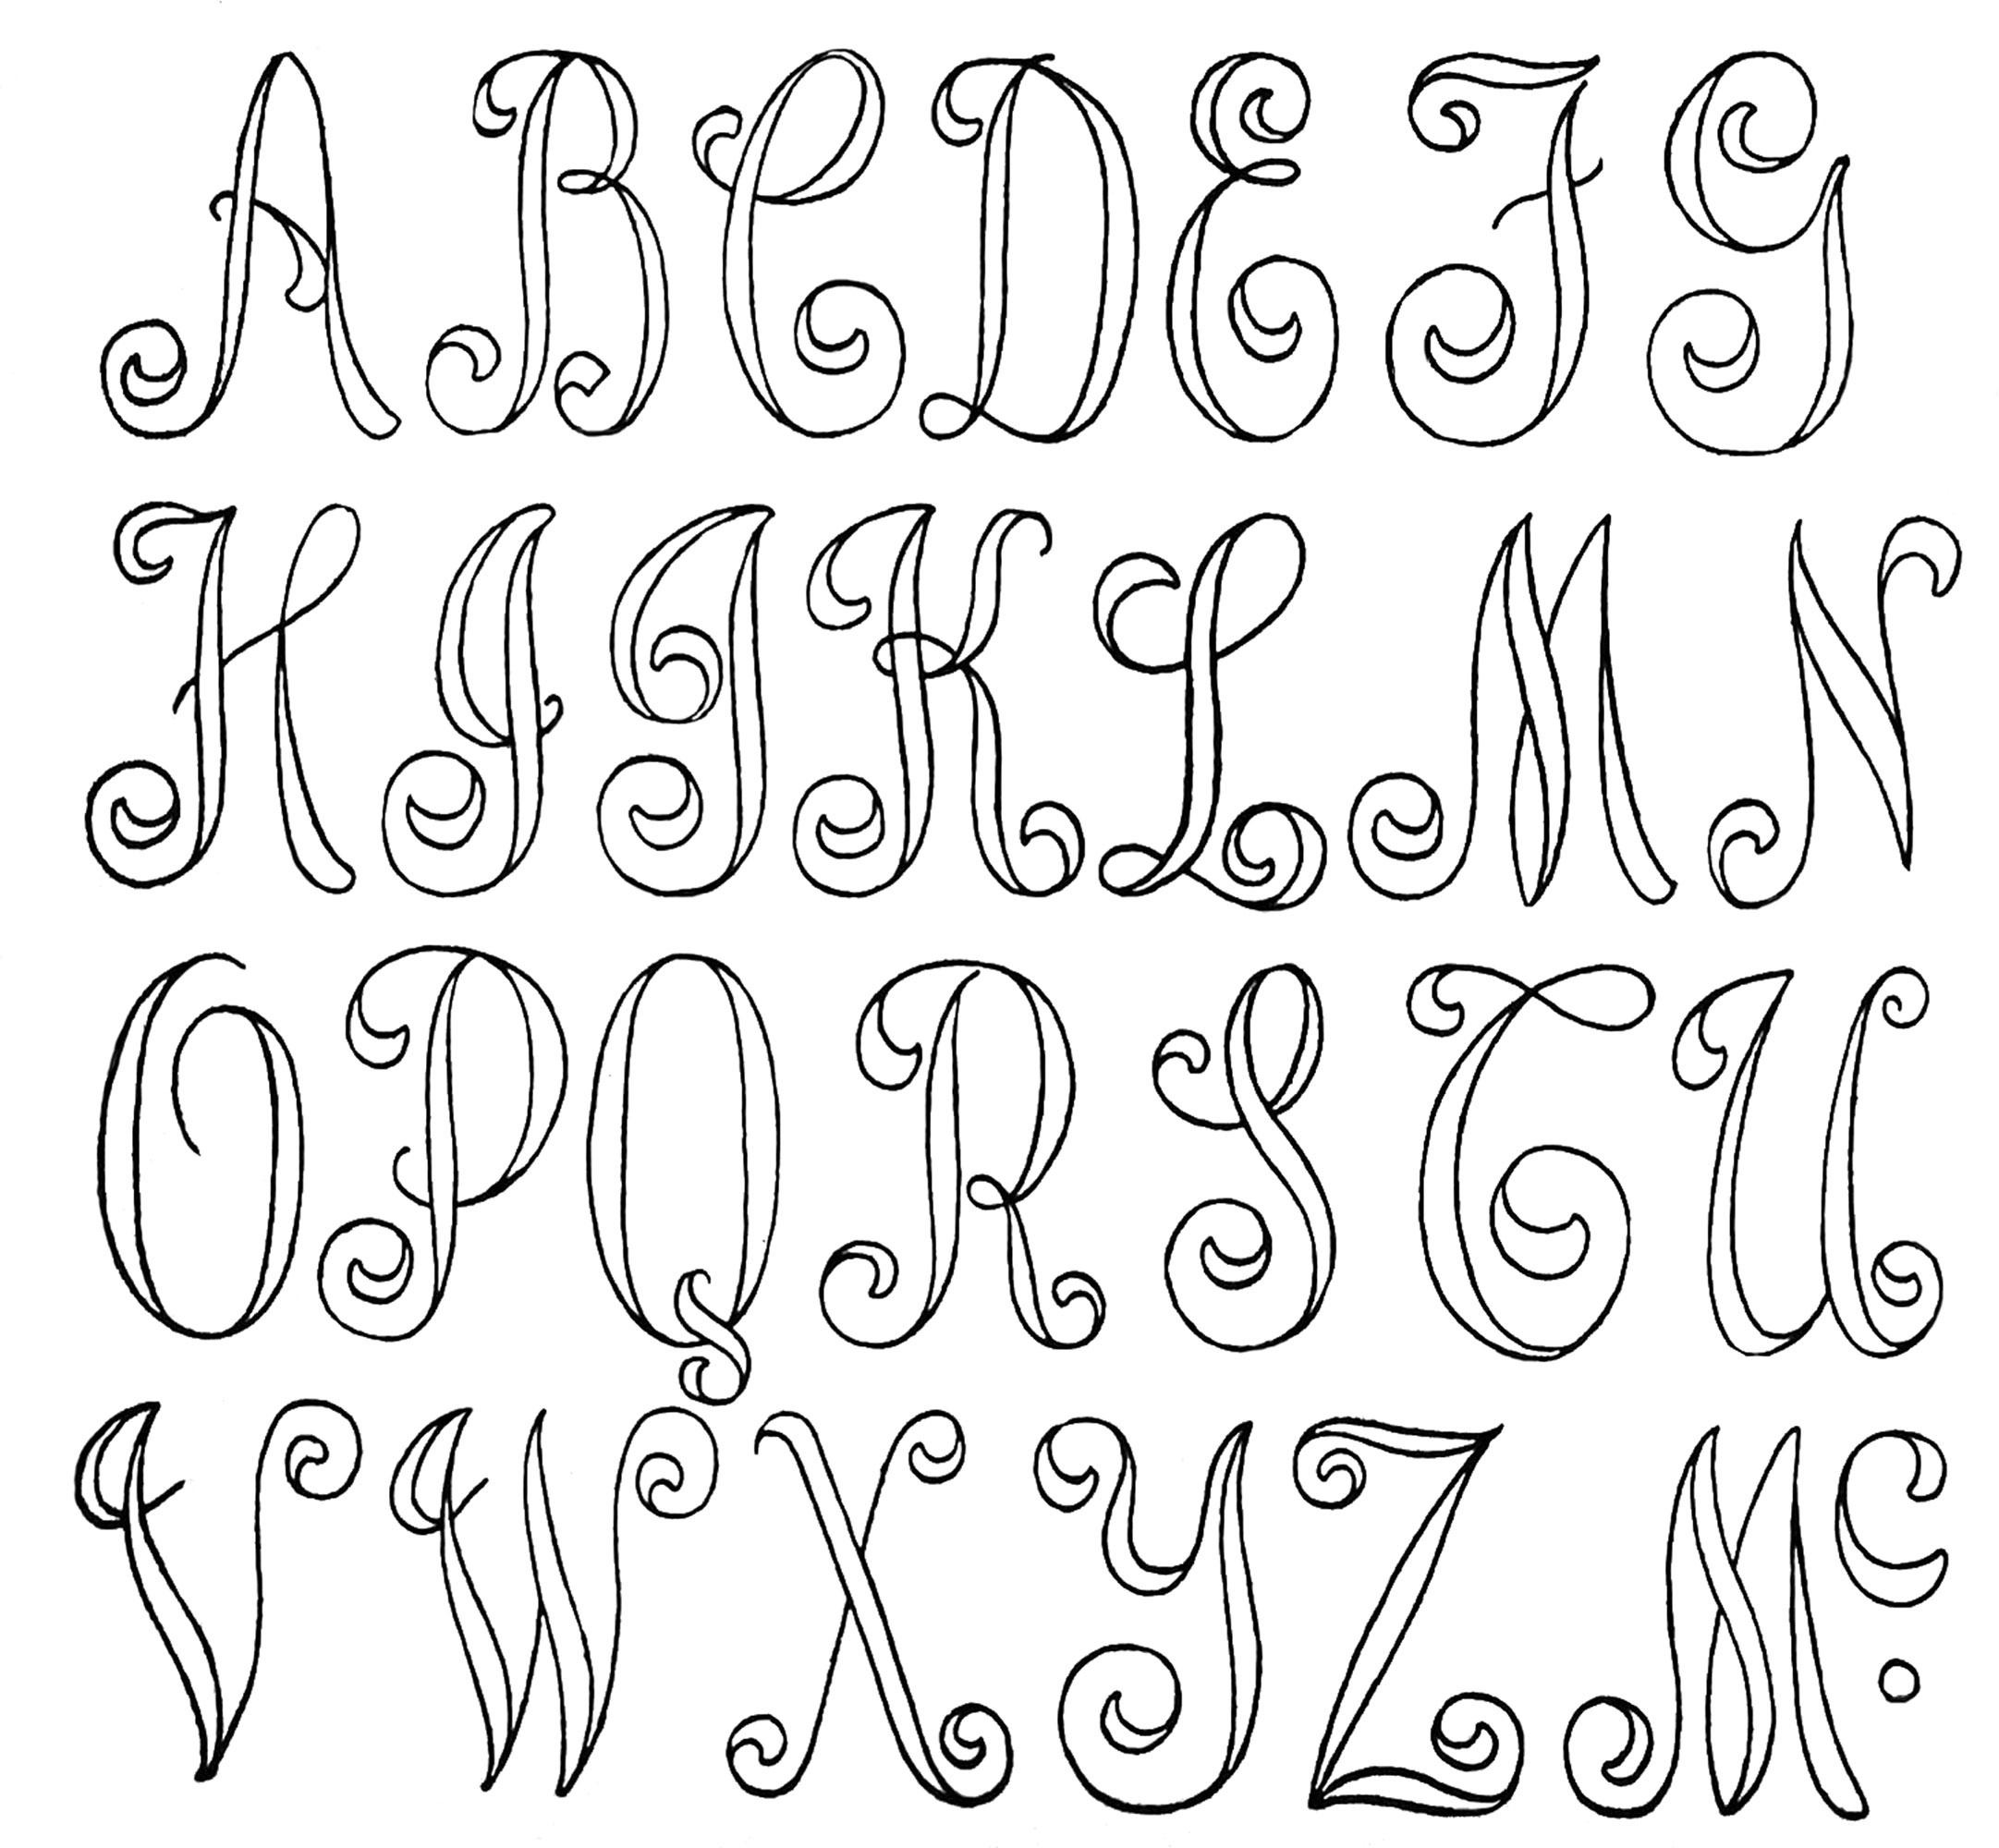 http://qisforquilter.com/wp-content/uploads/pillowcase-transfer-initials.jpg